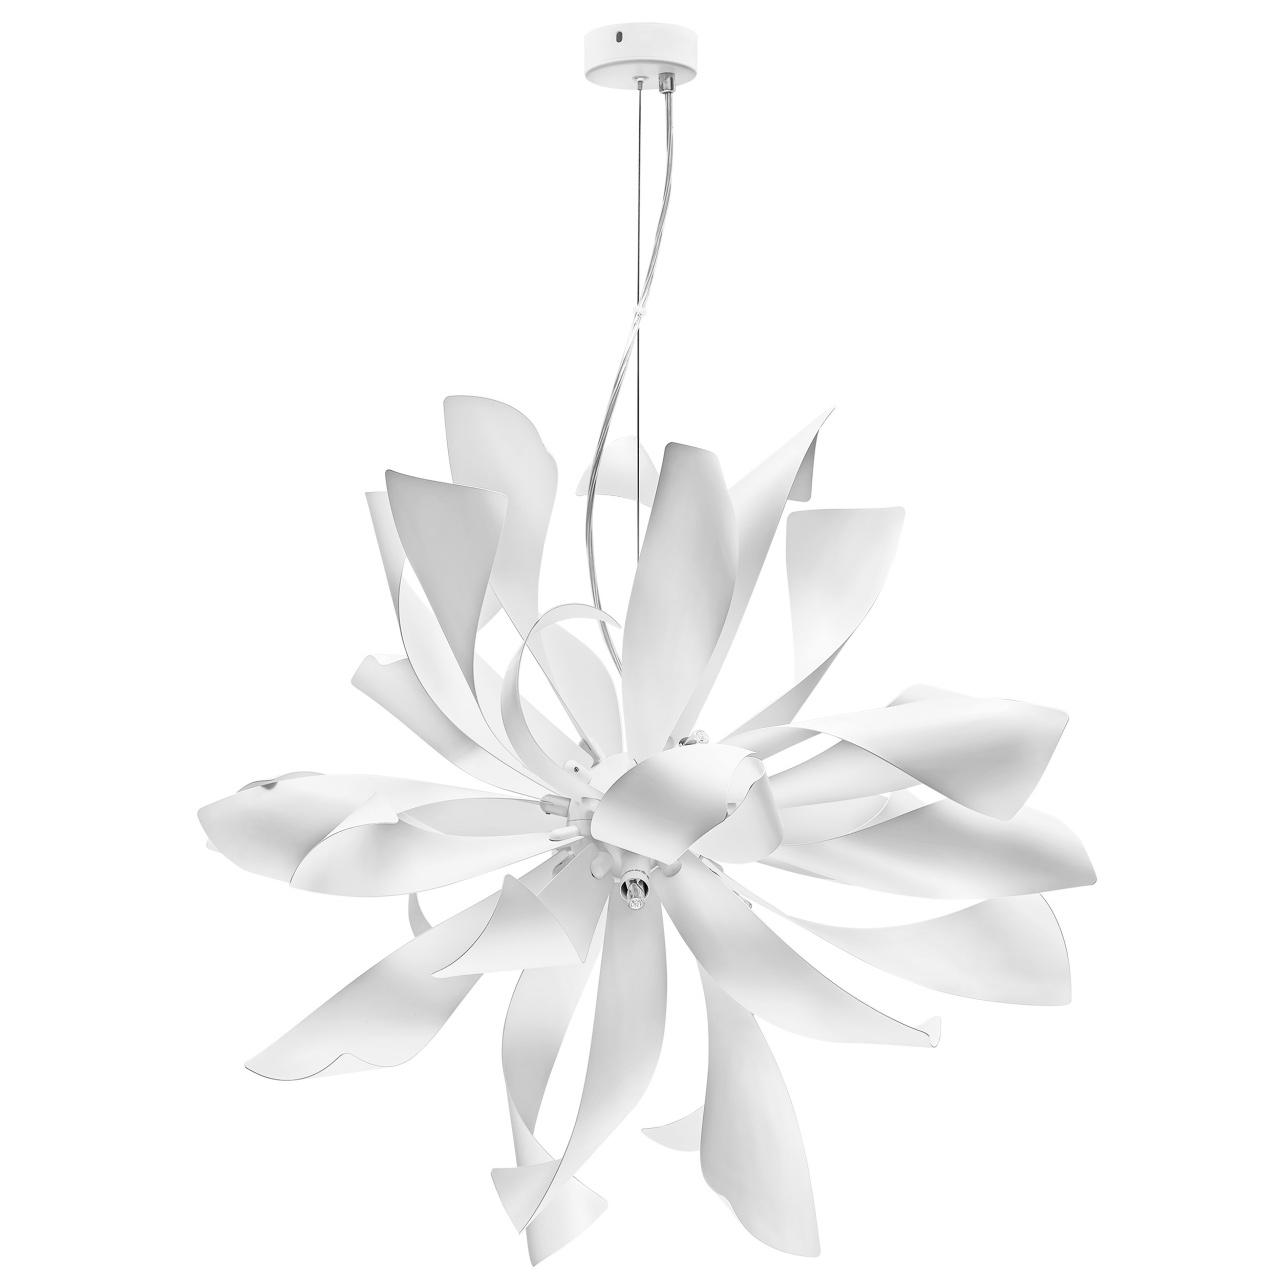 Люстра подвесная Turbio 6х40W G9 матовый белый Lightstar 754266